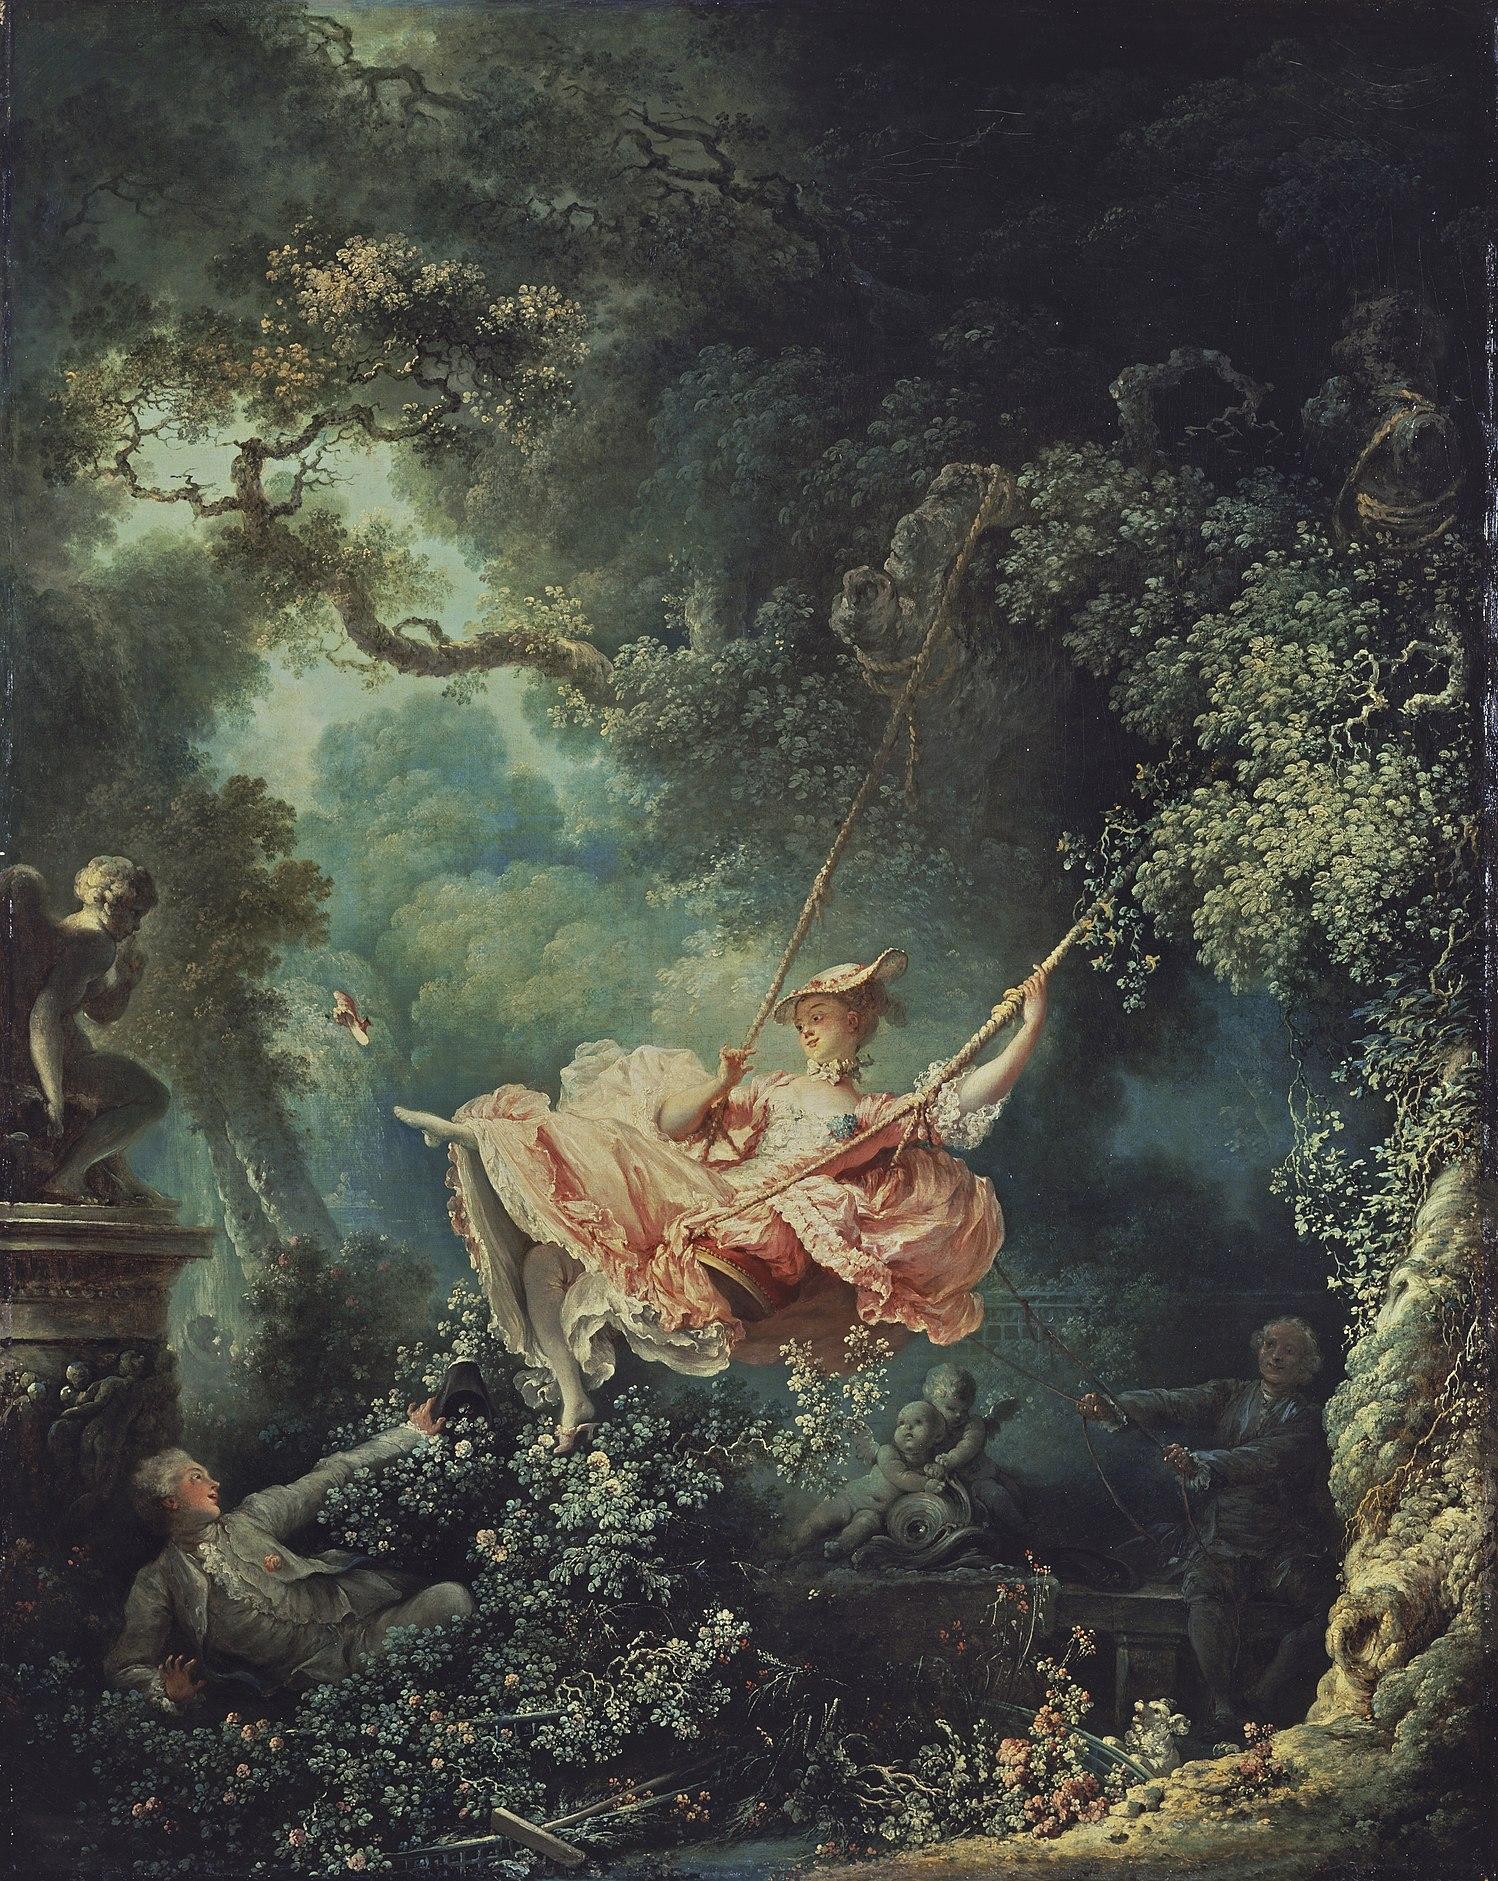 Fragonard swing rococo 18th century painting